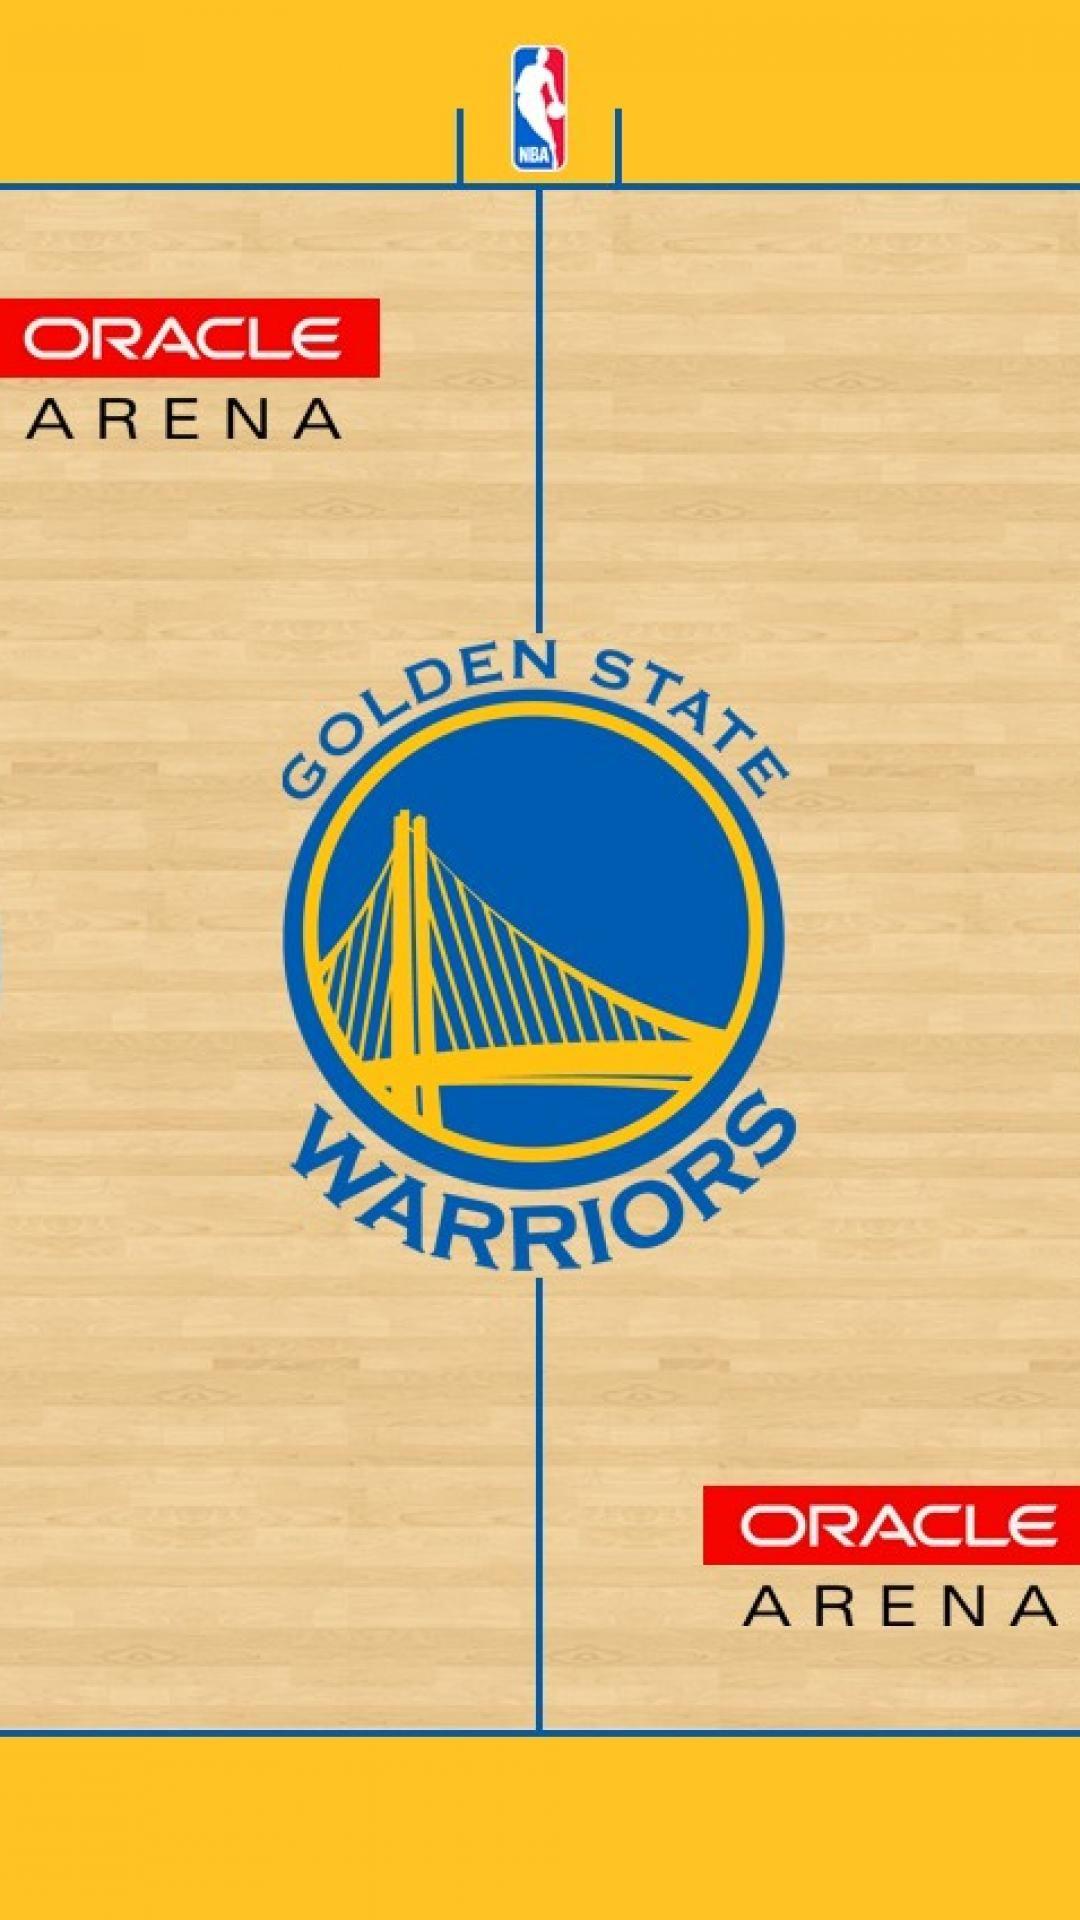 Golden State Warriors Wallpaper Iphone Golden State Warriors